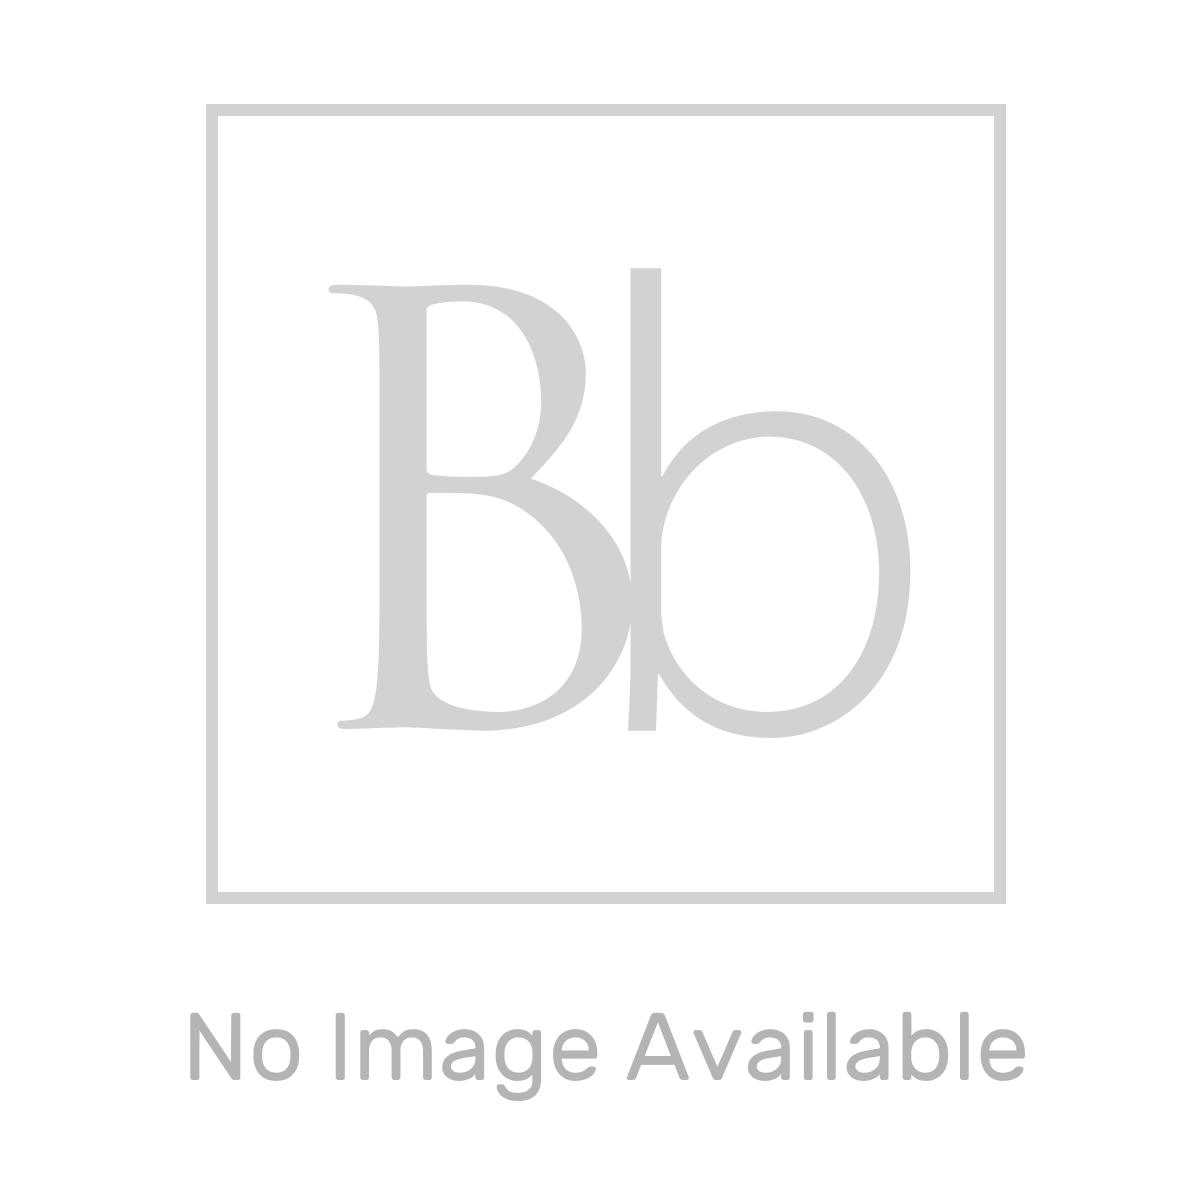 RAK Surface Greige Tile 600 x 600mm